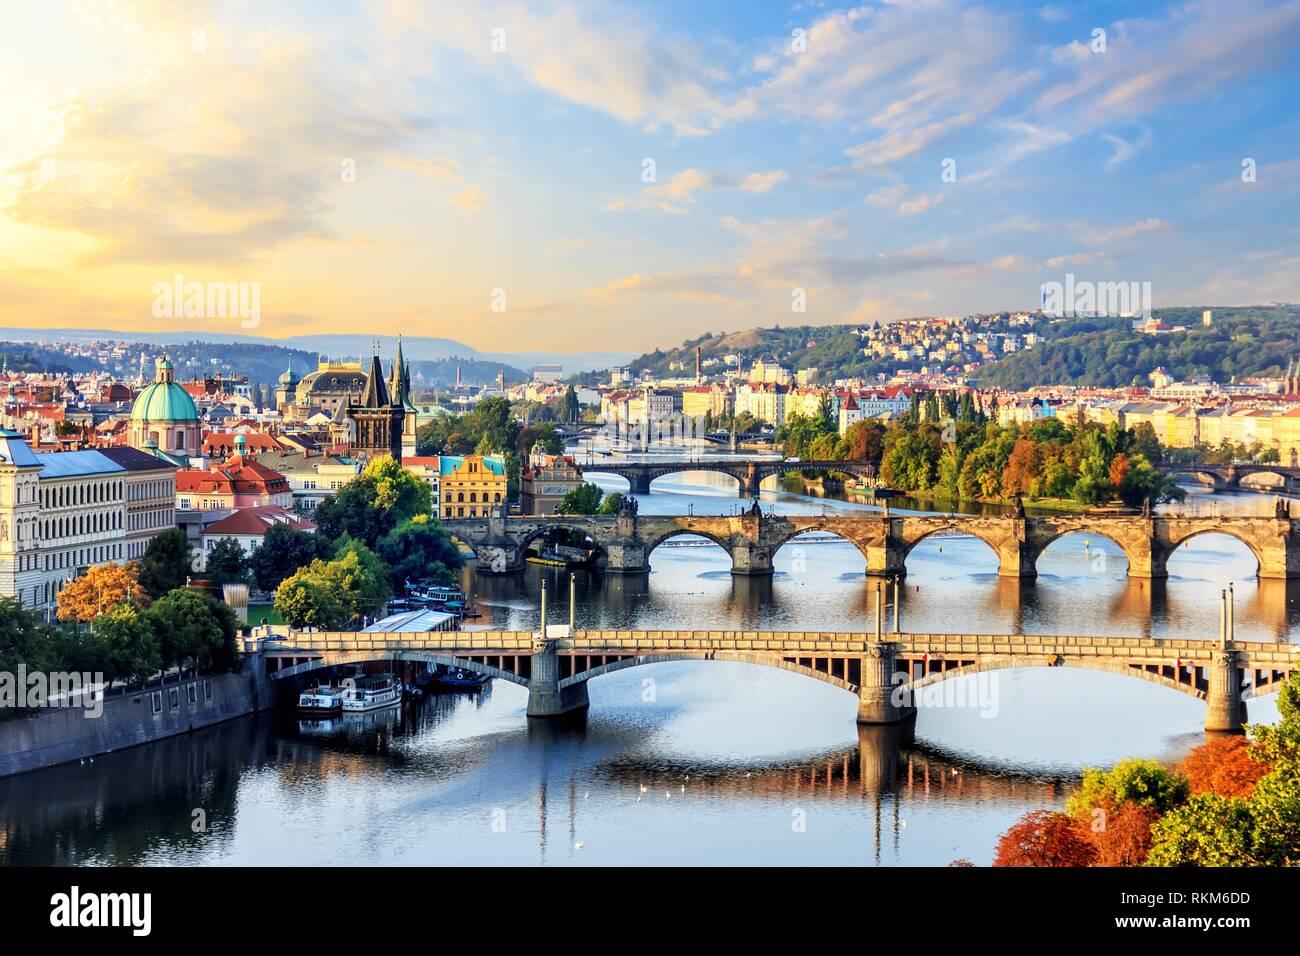 Bridges of Prague at sunrise, view from Prague Metronome. - Stock Image